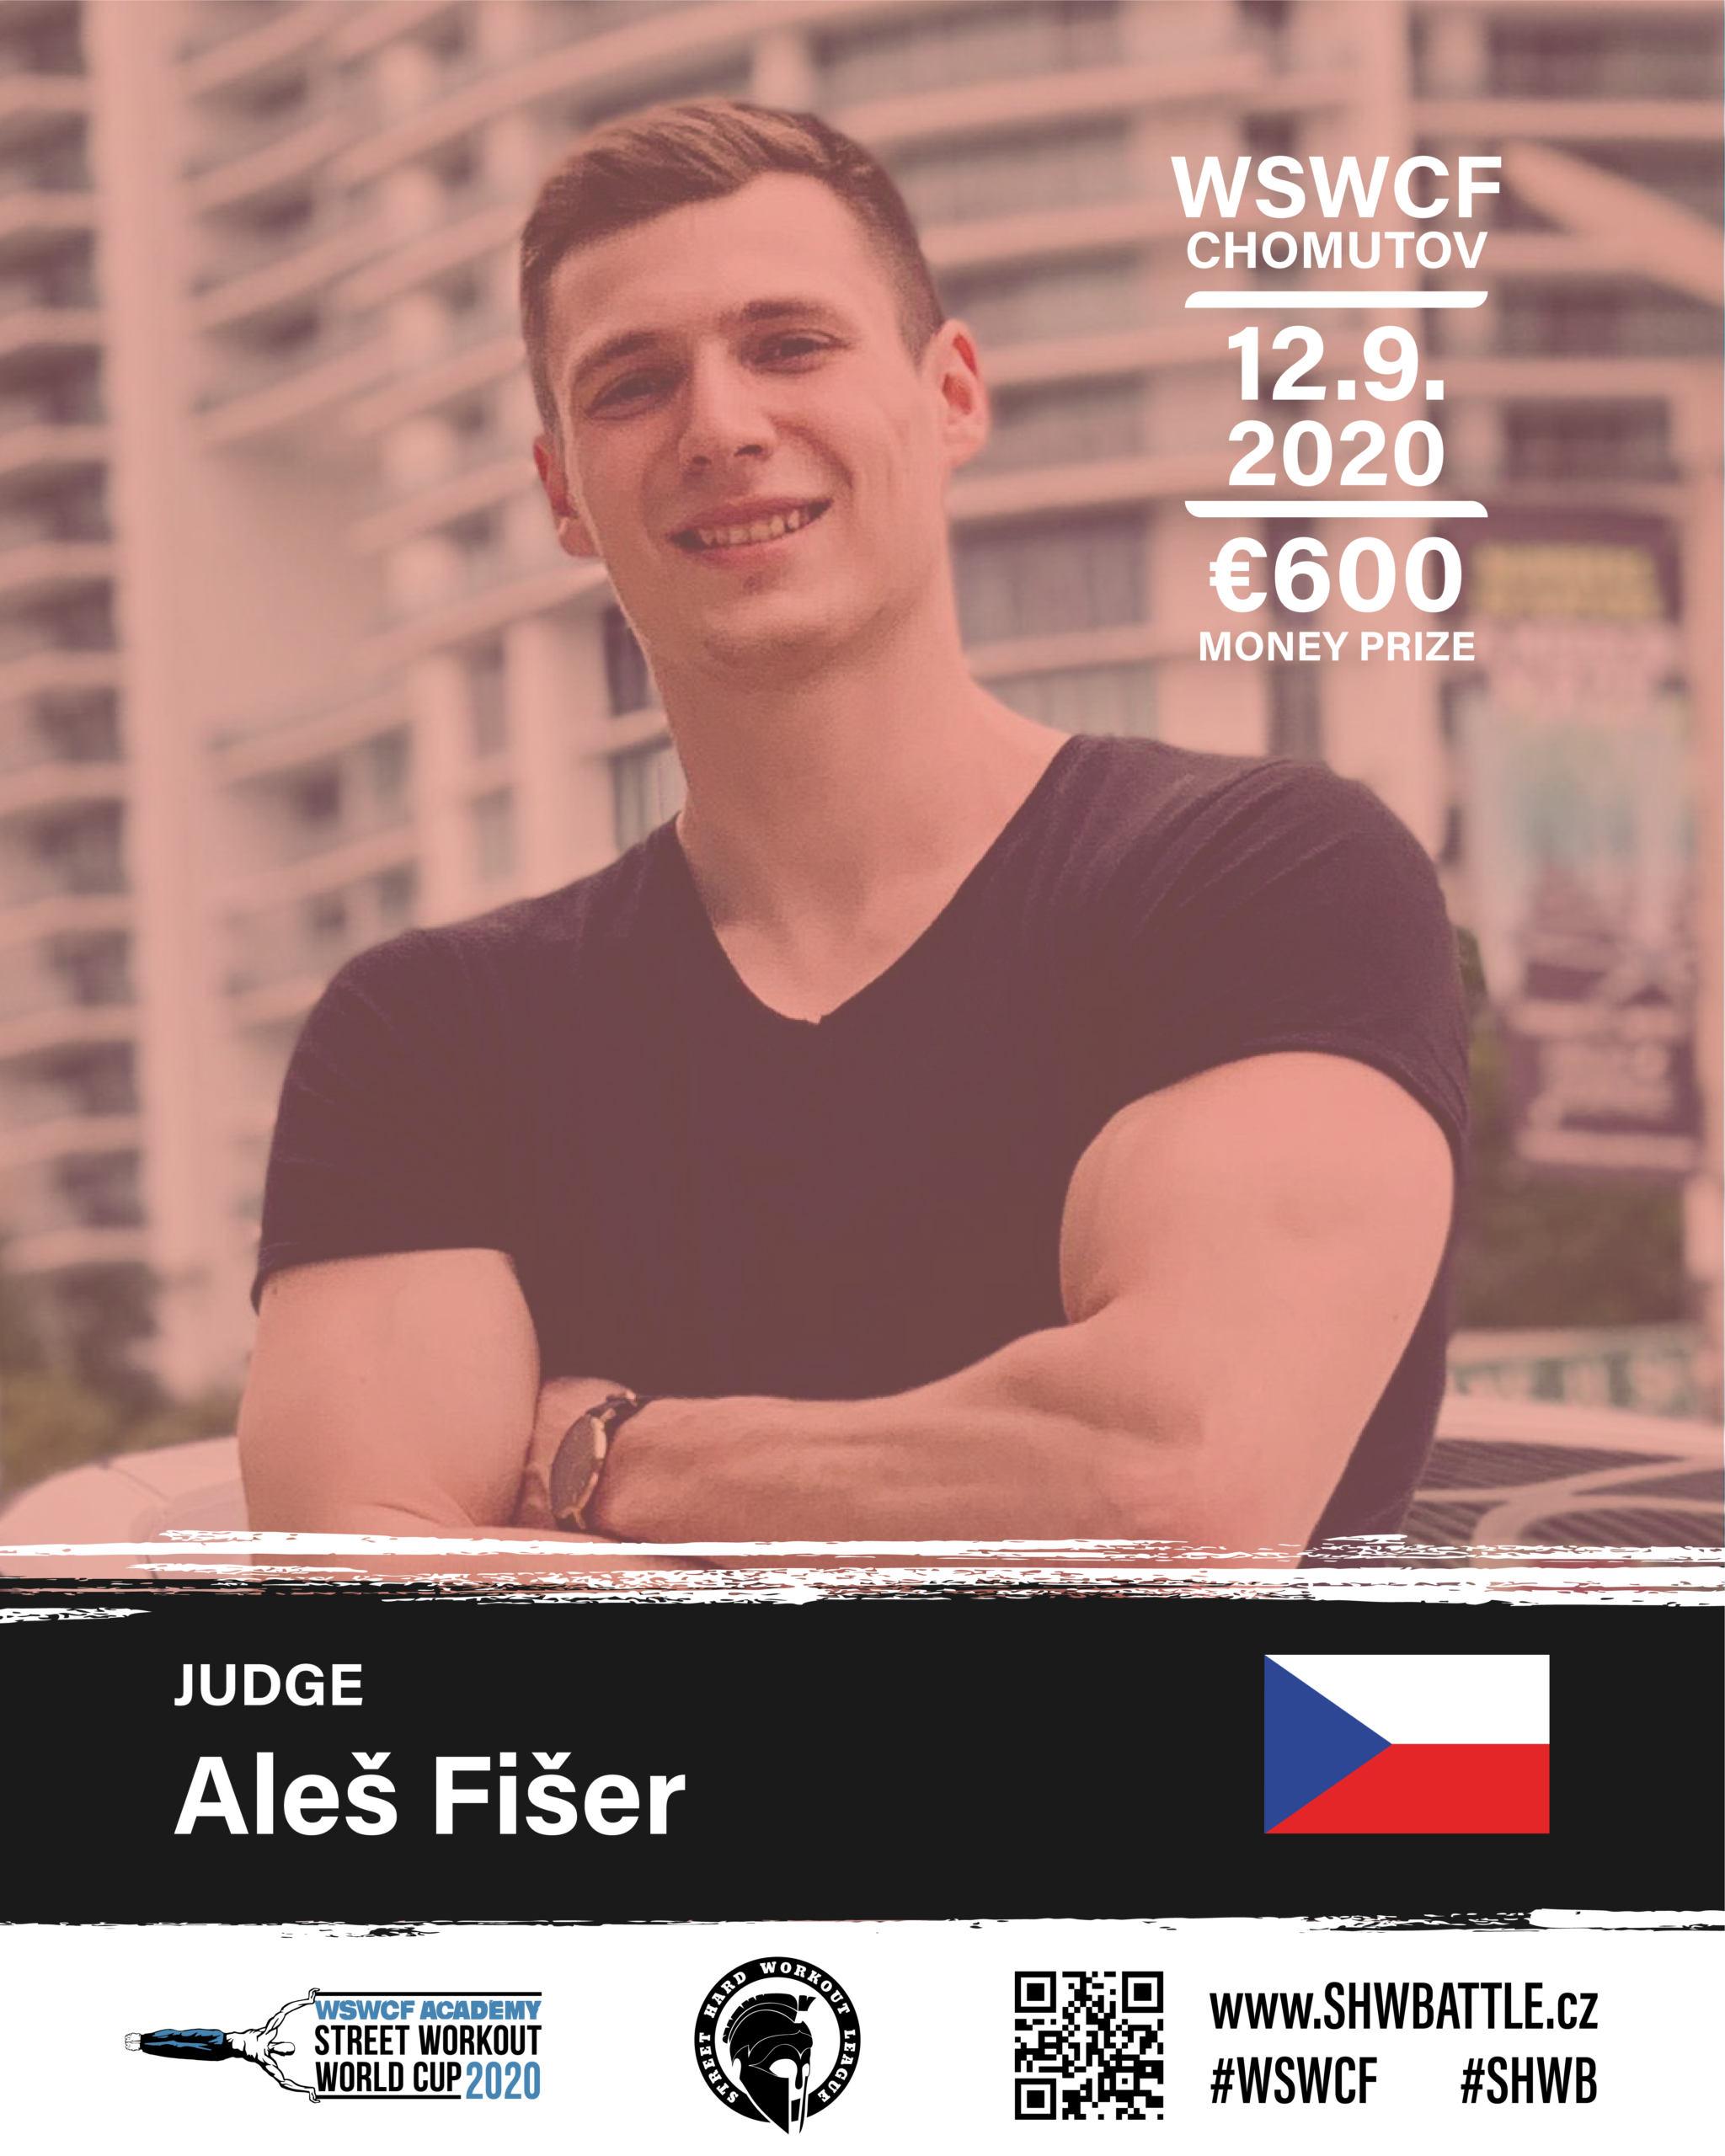 Aleš Fišer